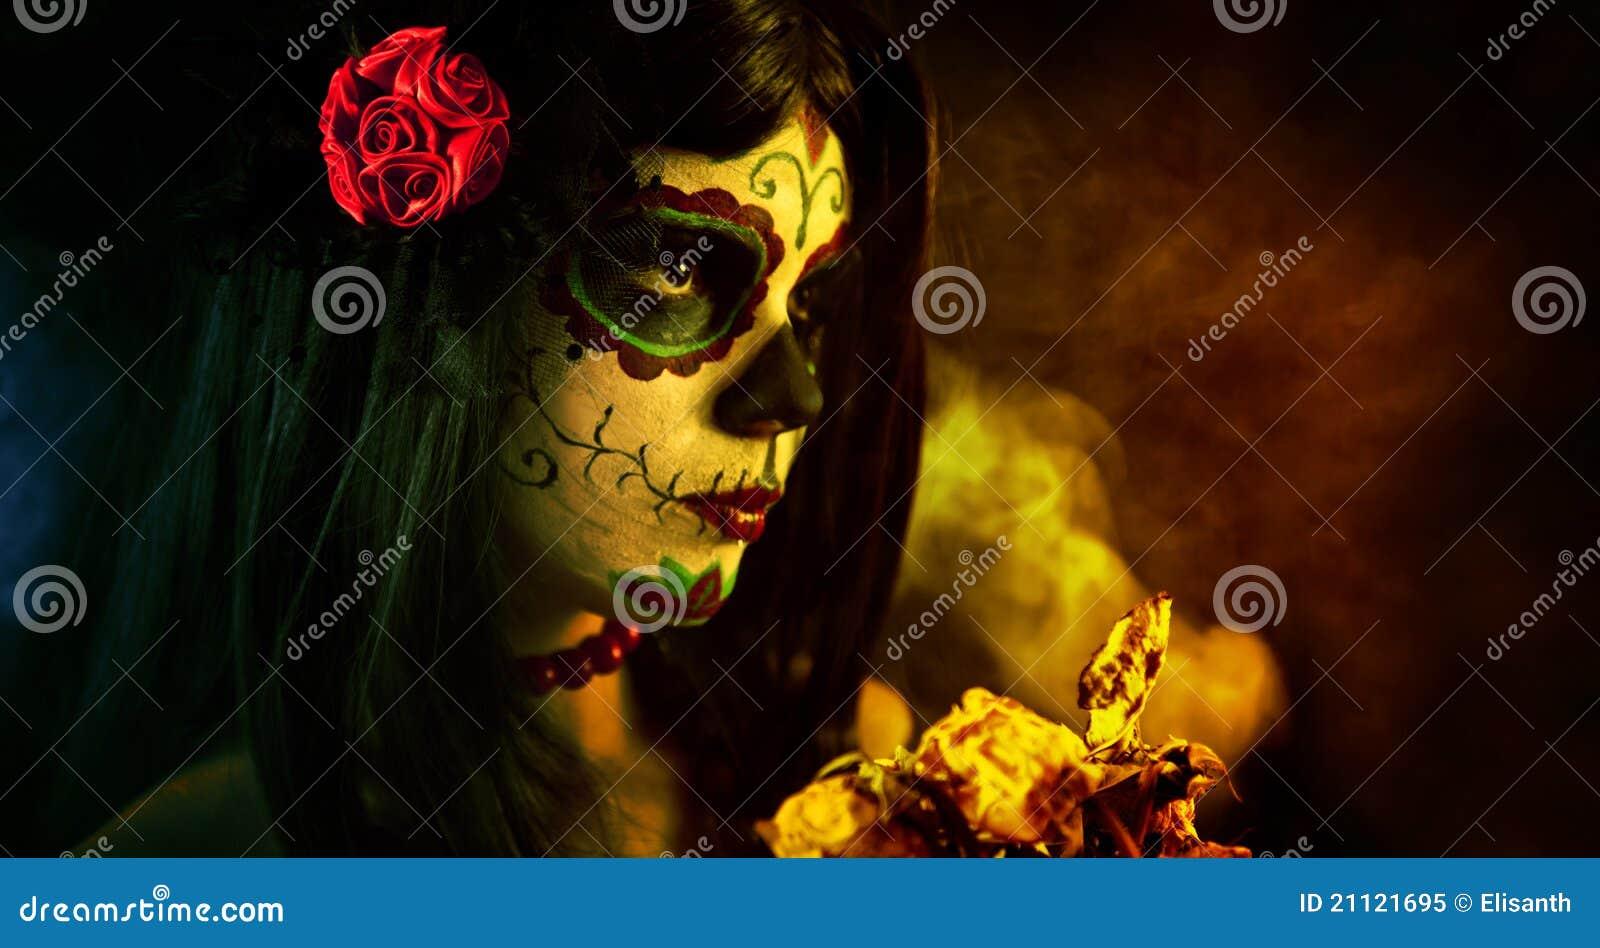 Artistic shot of sugar skull girl with dead roses